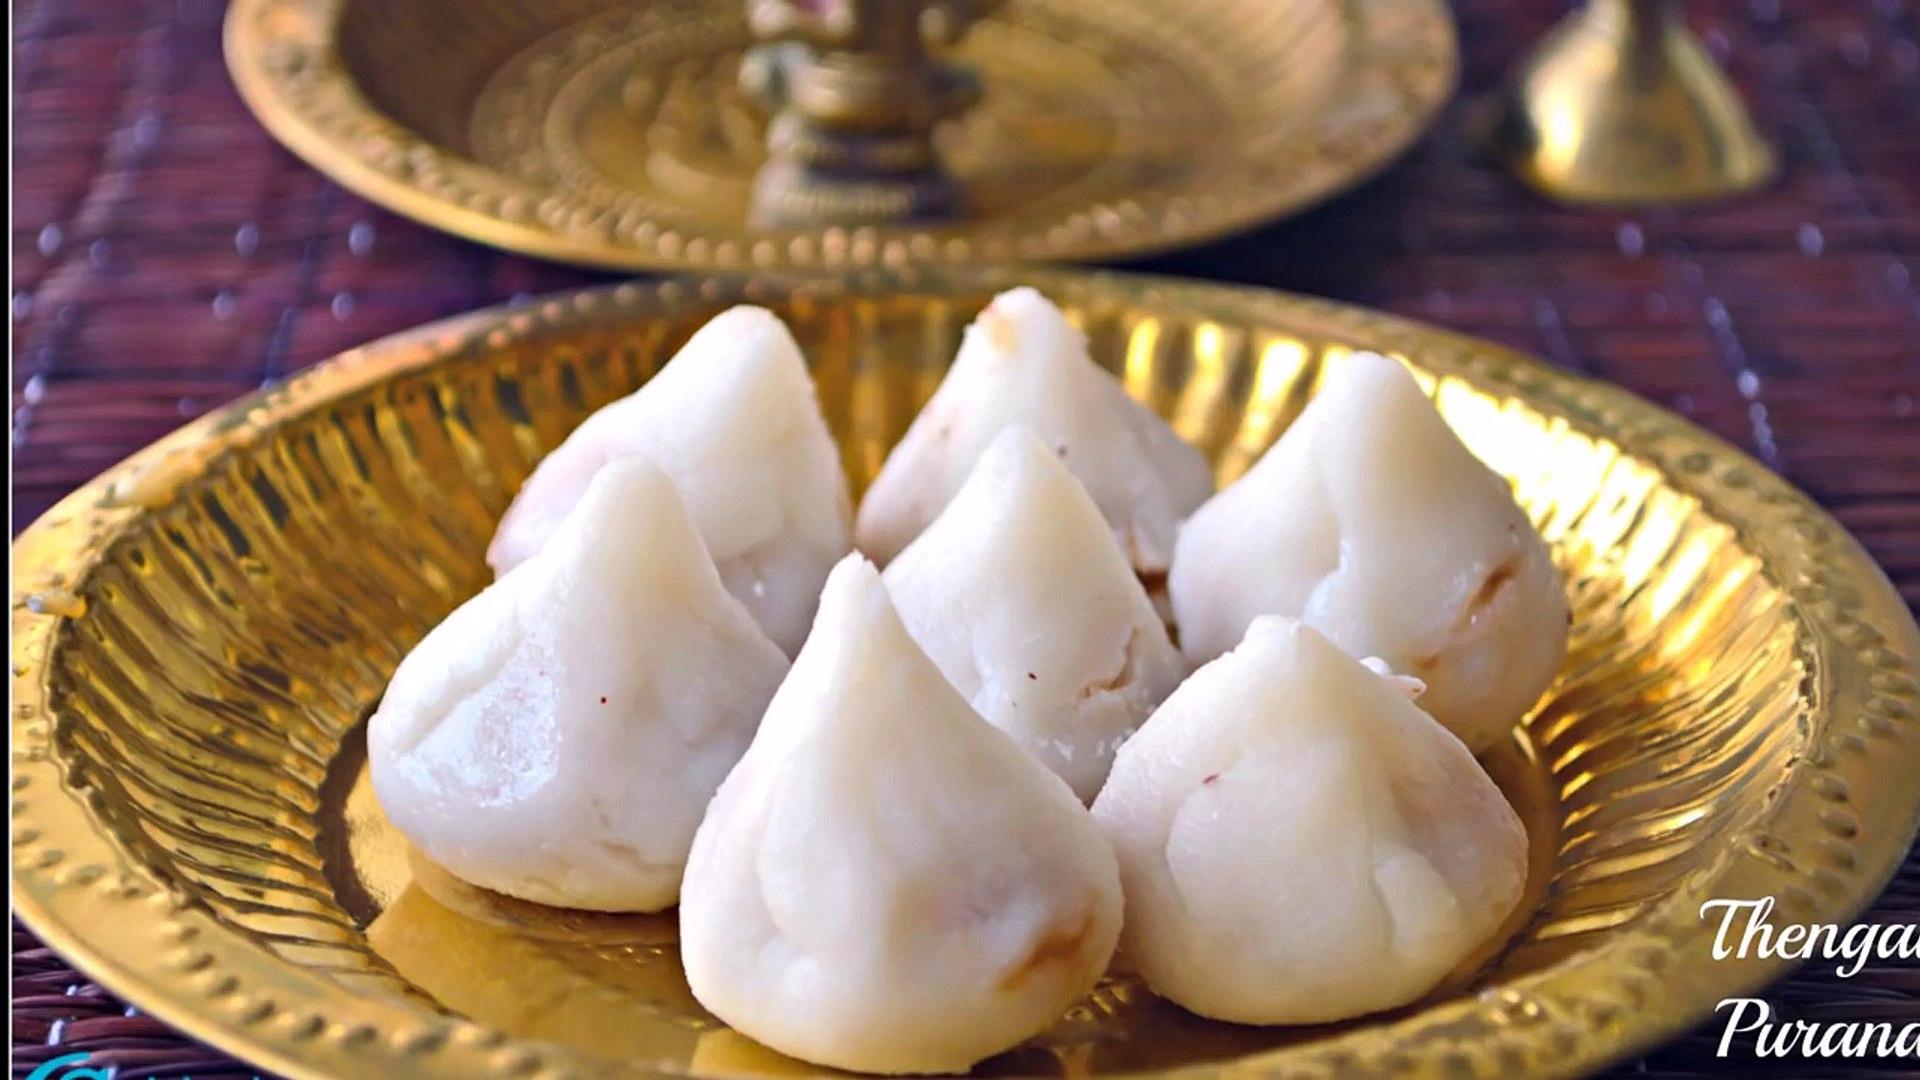 Modak Recipe / Thengai Purana Kozhukattai Recipe